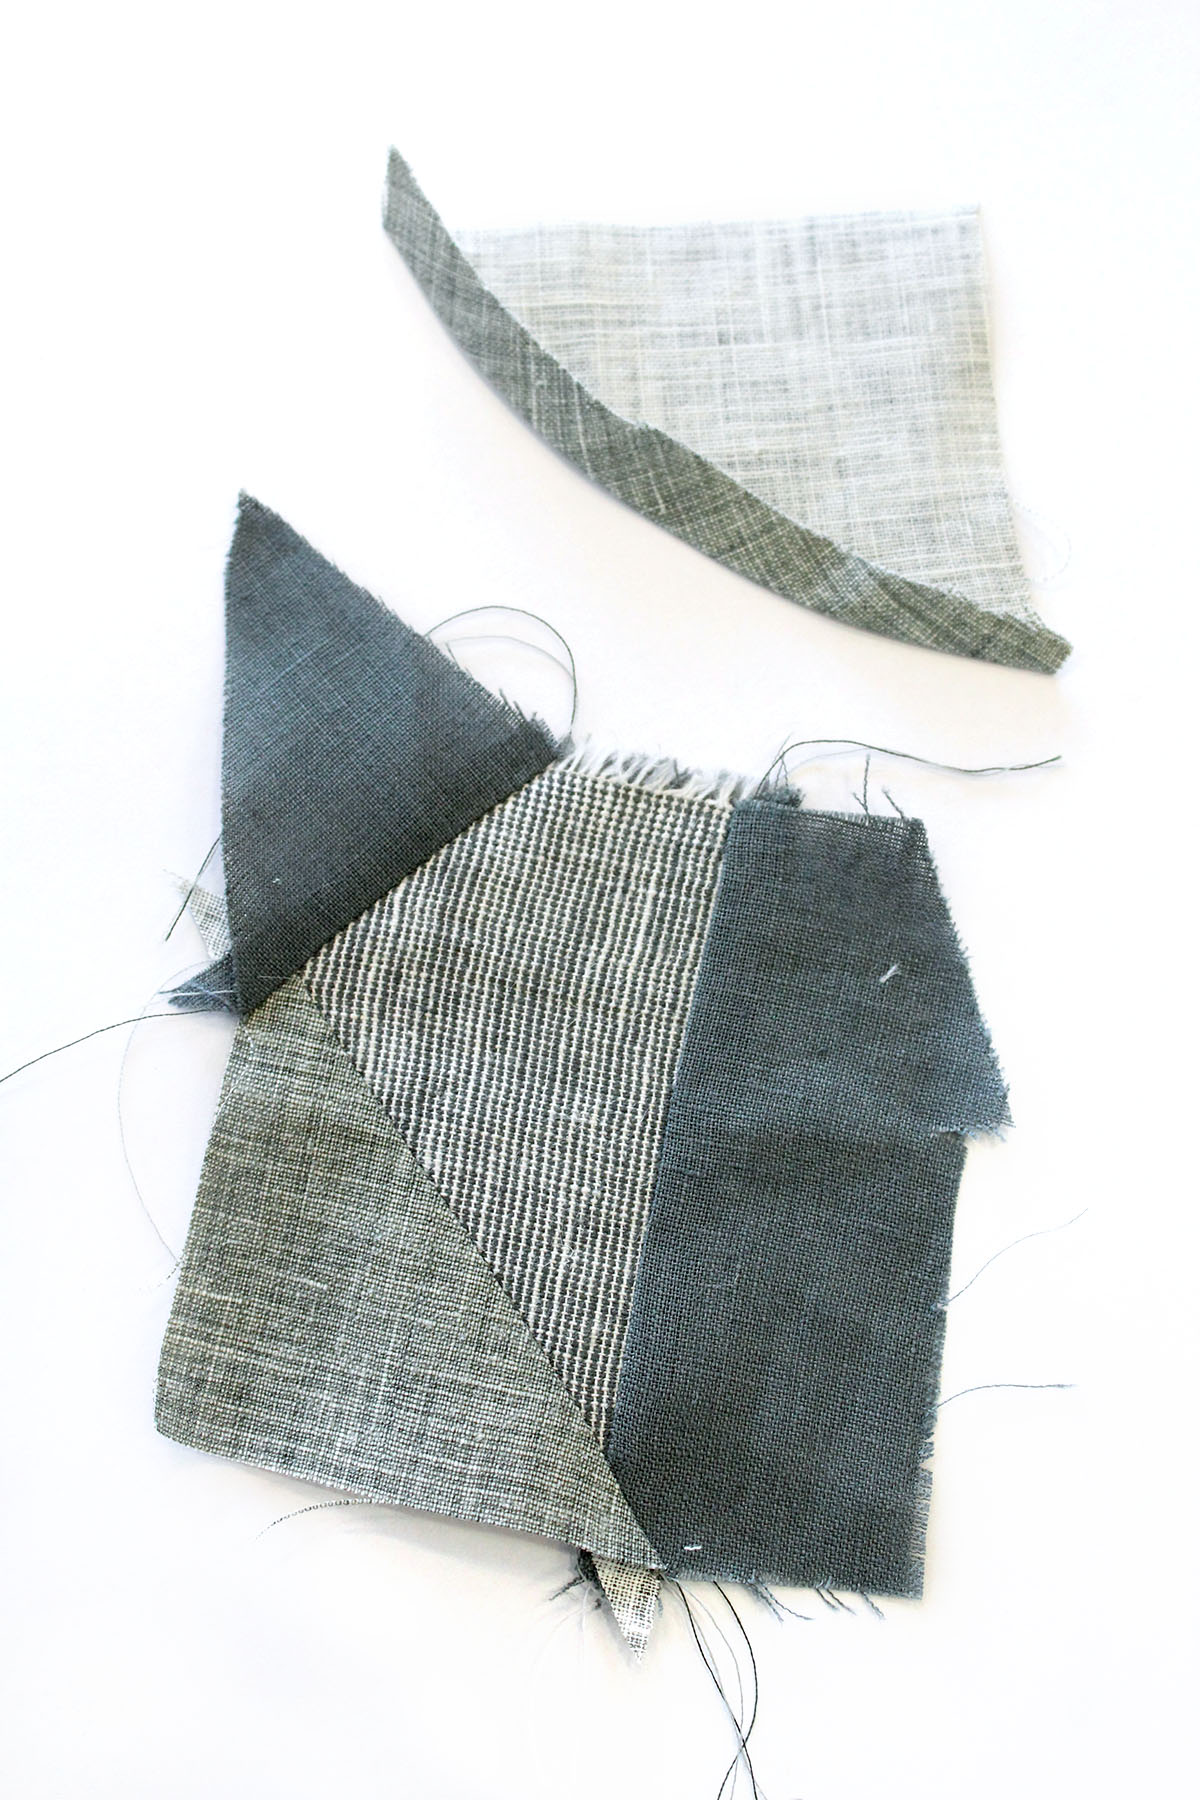 Megan Nielsen Patterns | Hovea Sewalong: Scrap Quilting | Curved Seams - The Applique Method